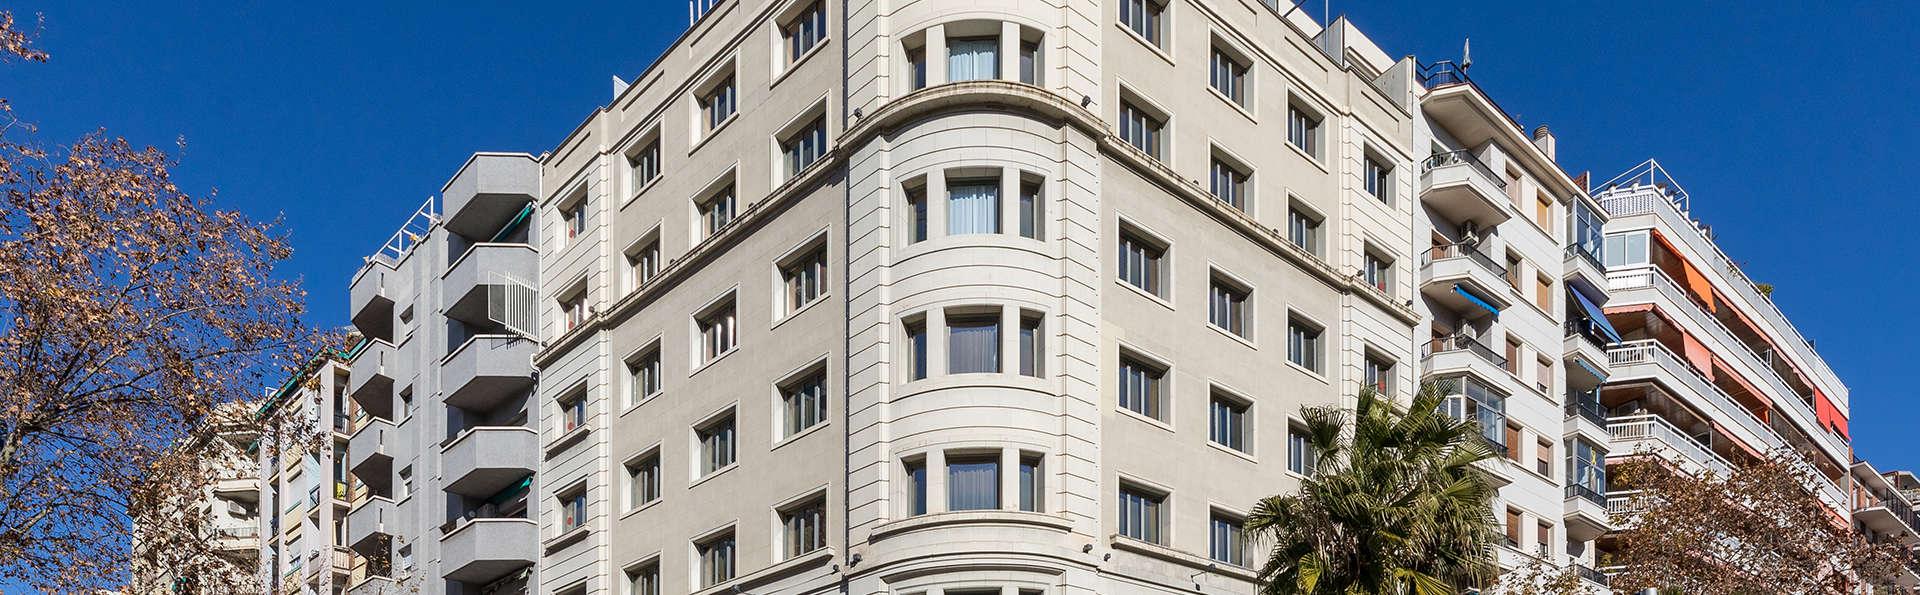 Sercotel Amister Art Hotel Barcelona - EDIT_FACHADA.jpg